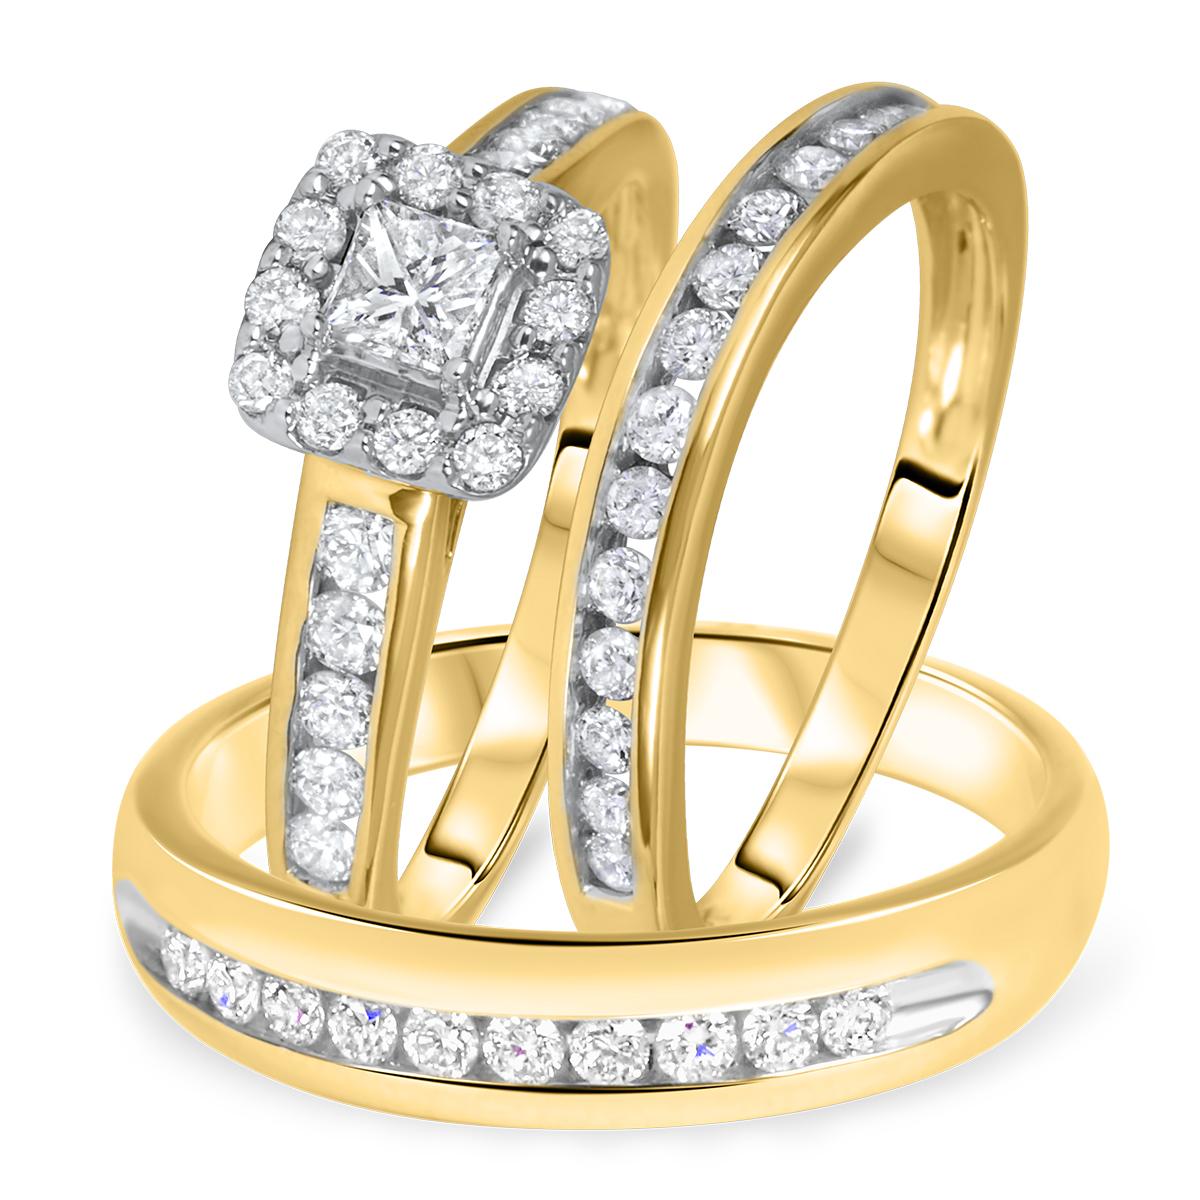 1 1/5 Carat T.W. Solitaire,Princess, Round Cut Diamond Women's Engagement Ring,